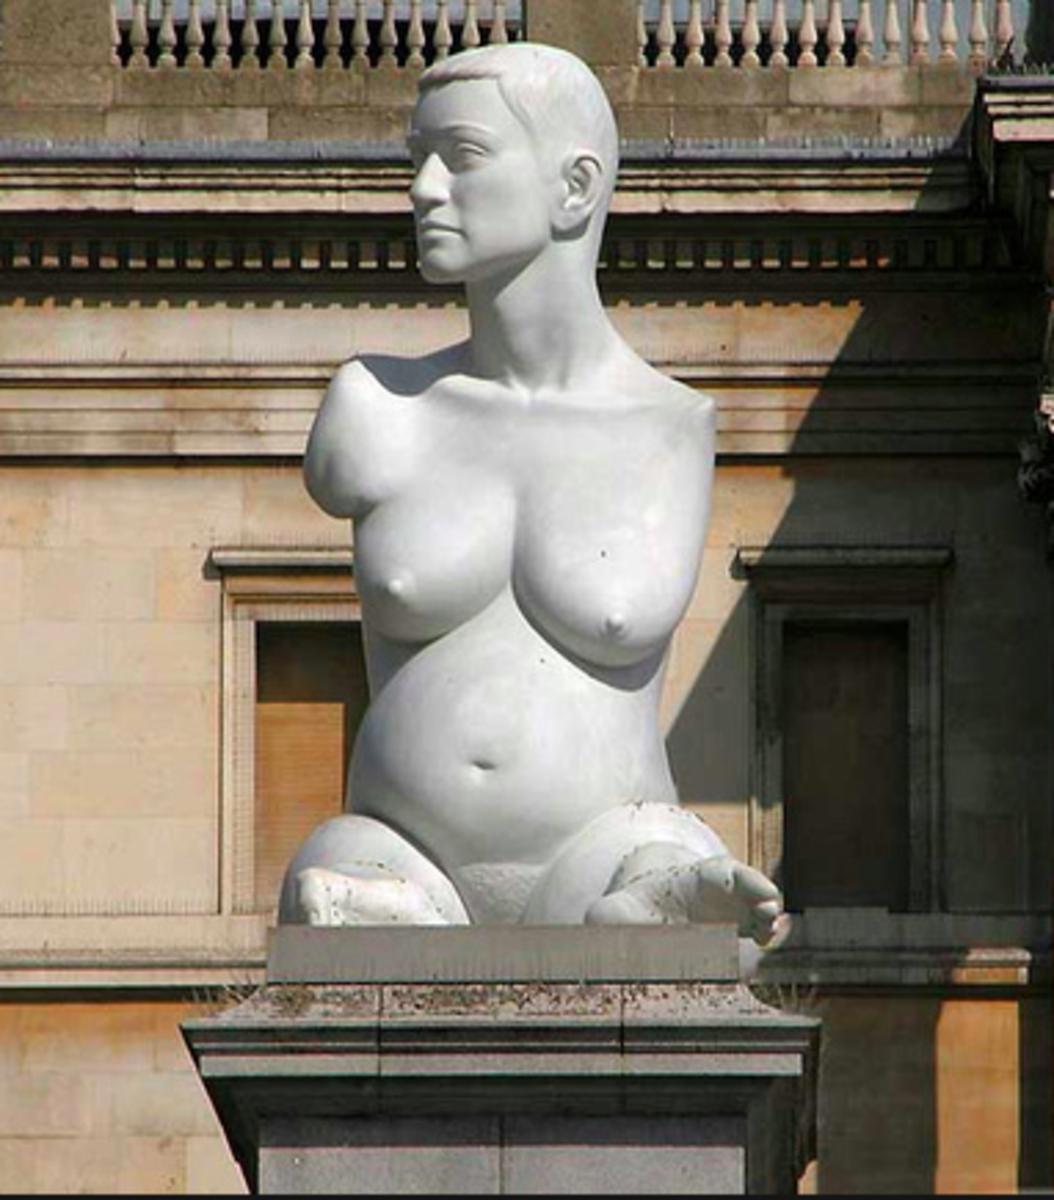 Statue of Alison Lapper by Marc Quinn